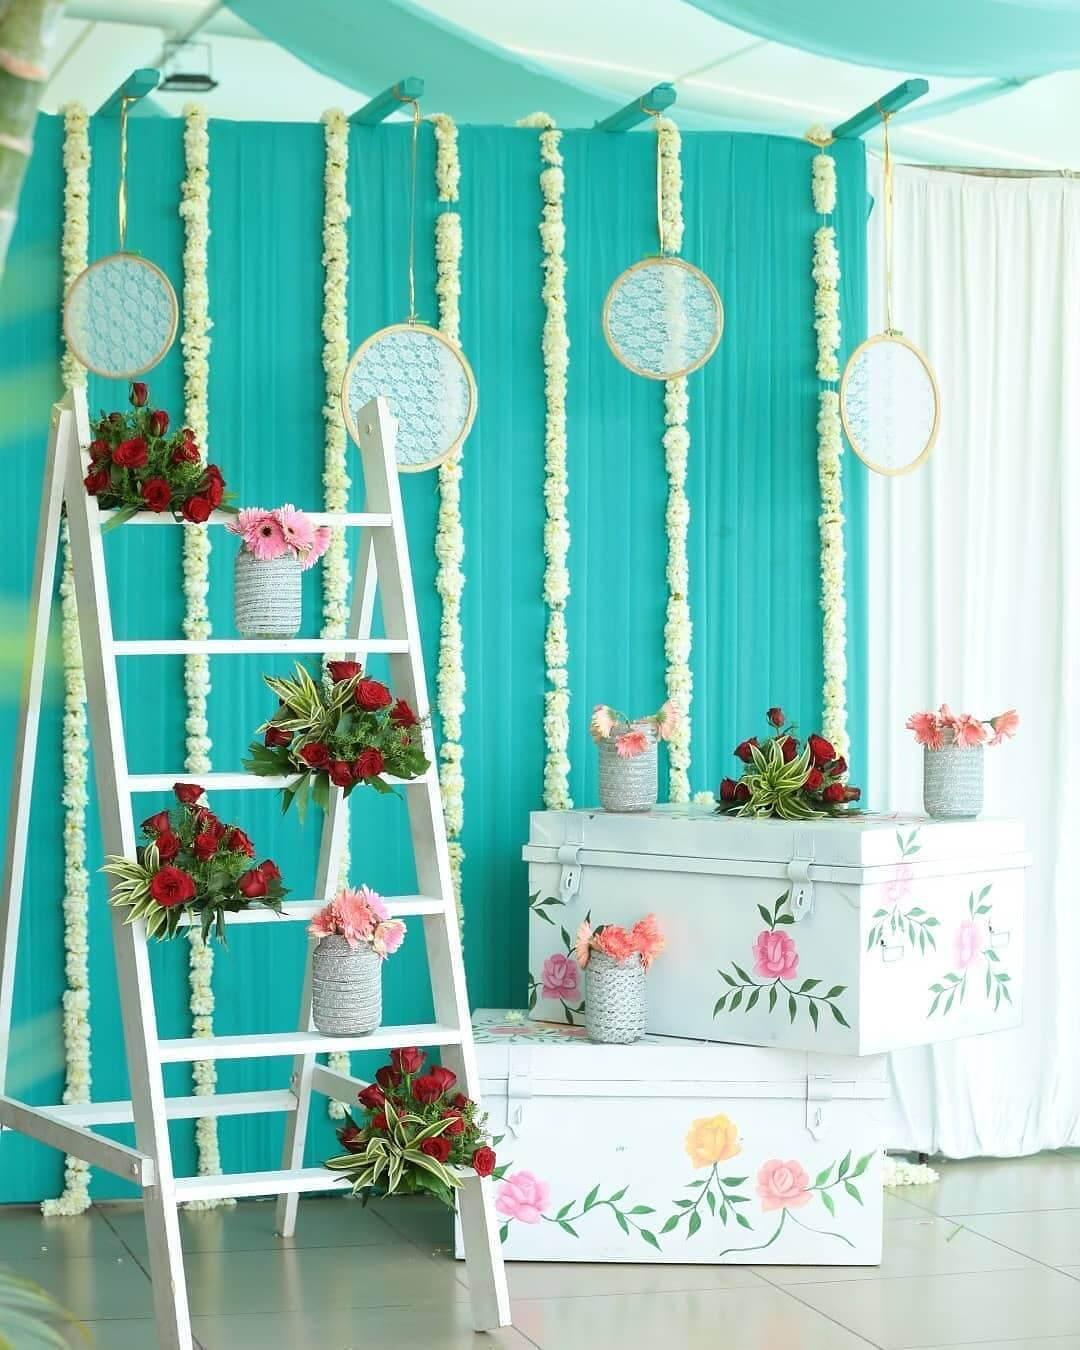 DIY decor ideas